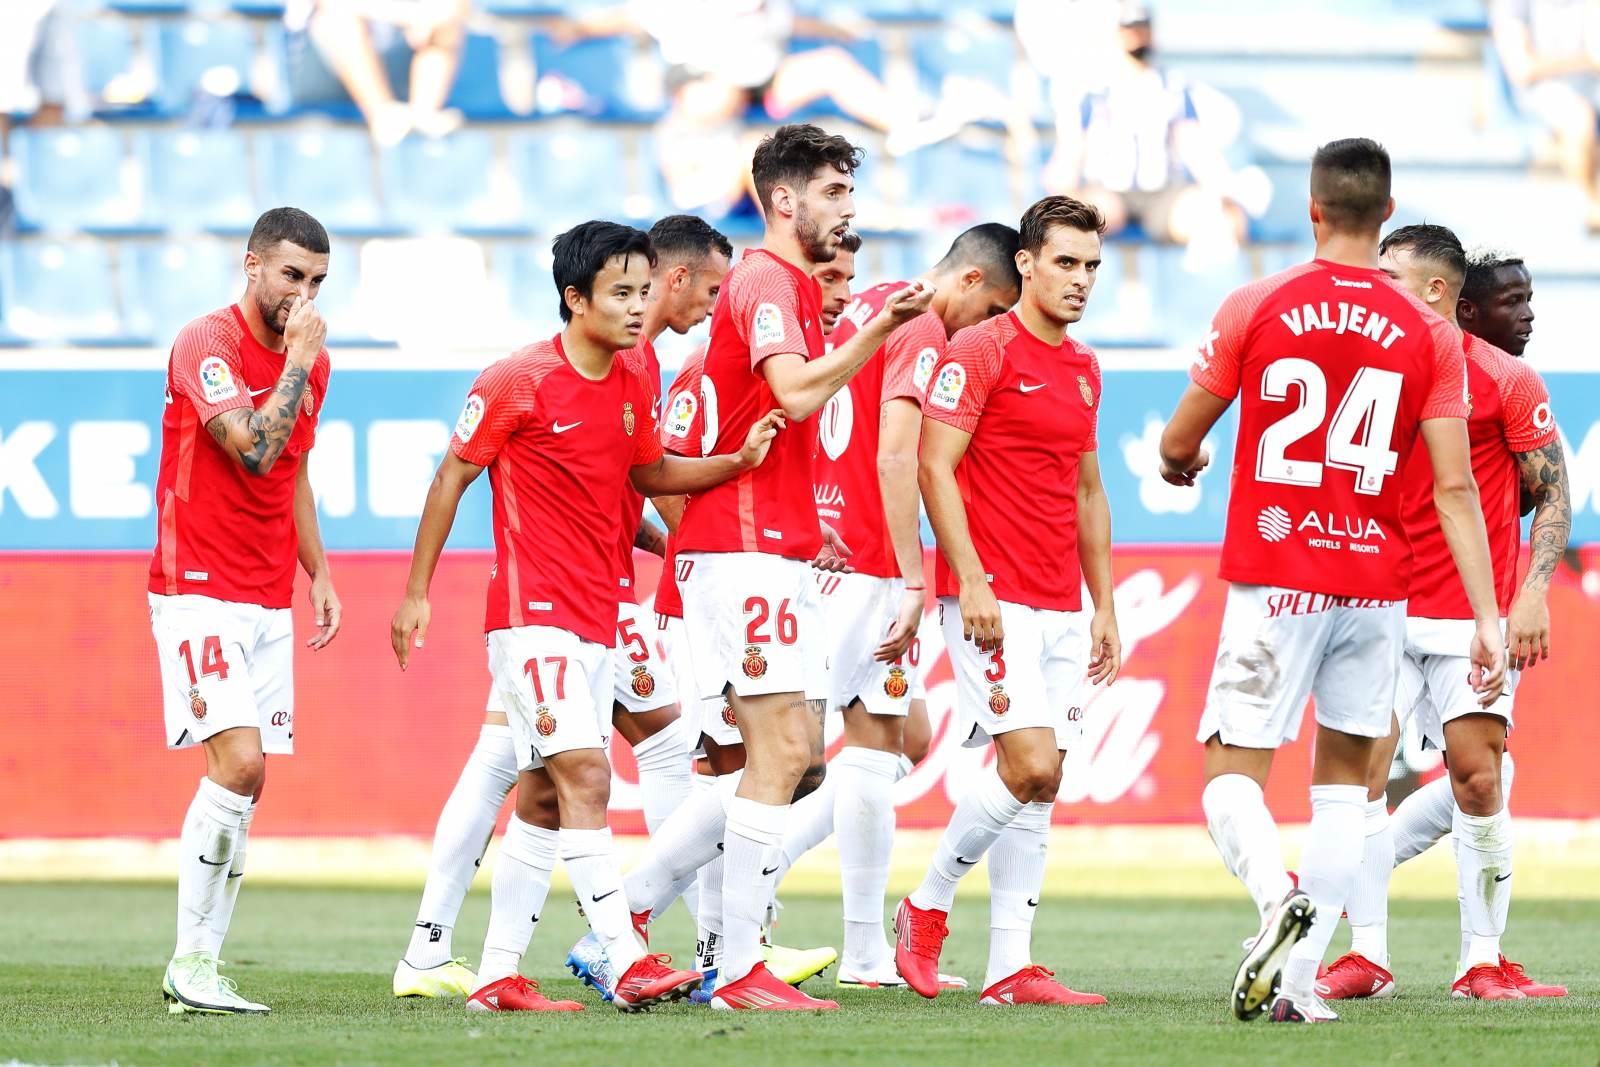 «Мальорка» - «Осасуна»: прогноз на матч чемпионата Испании - 26 сентября 2021